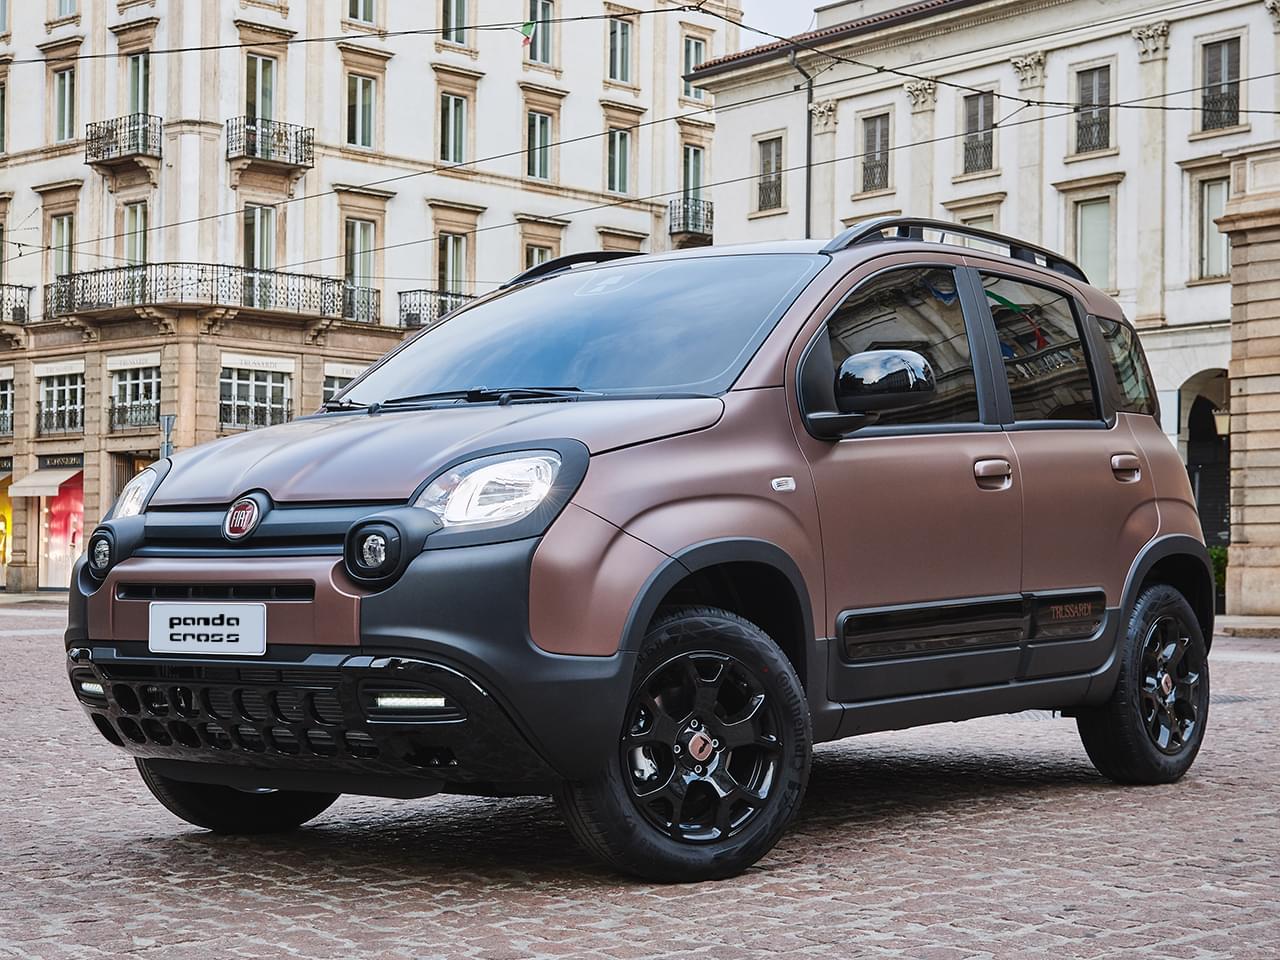 Fiat Panda Trussardi 1.2 16V